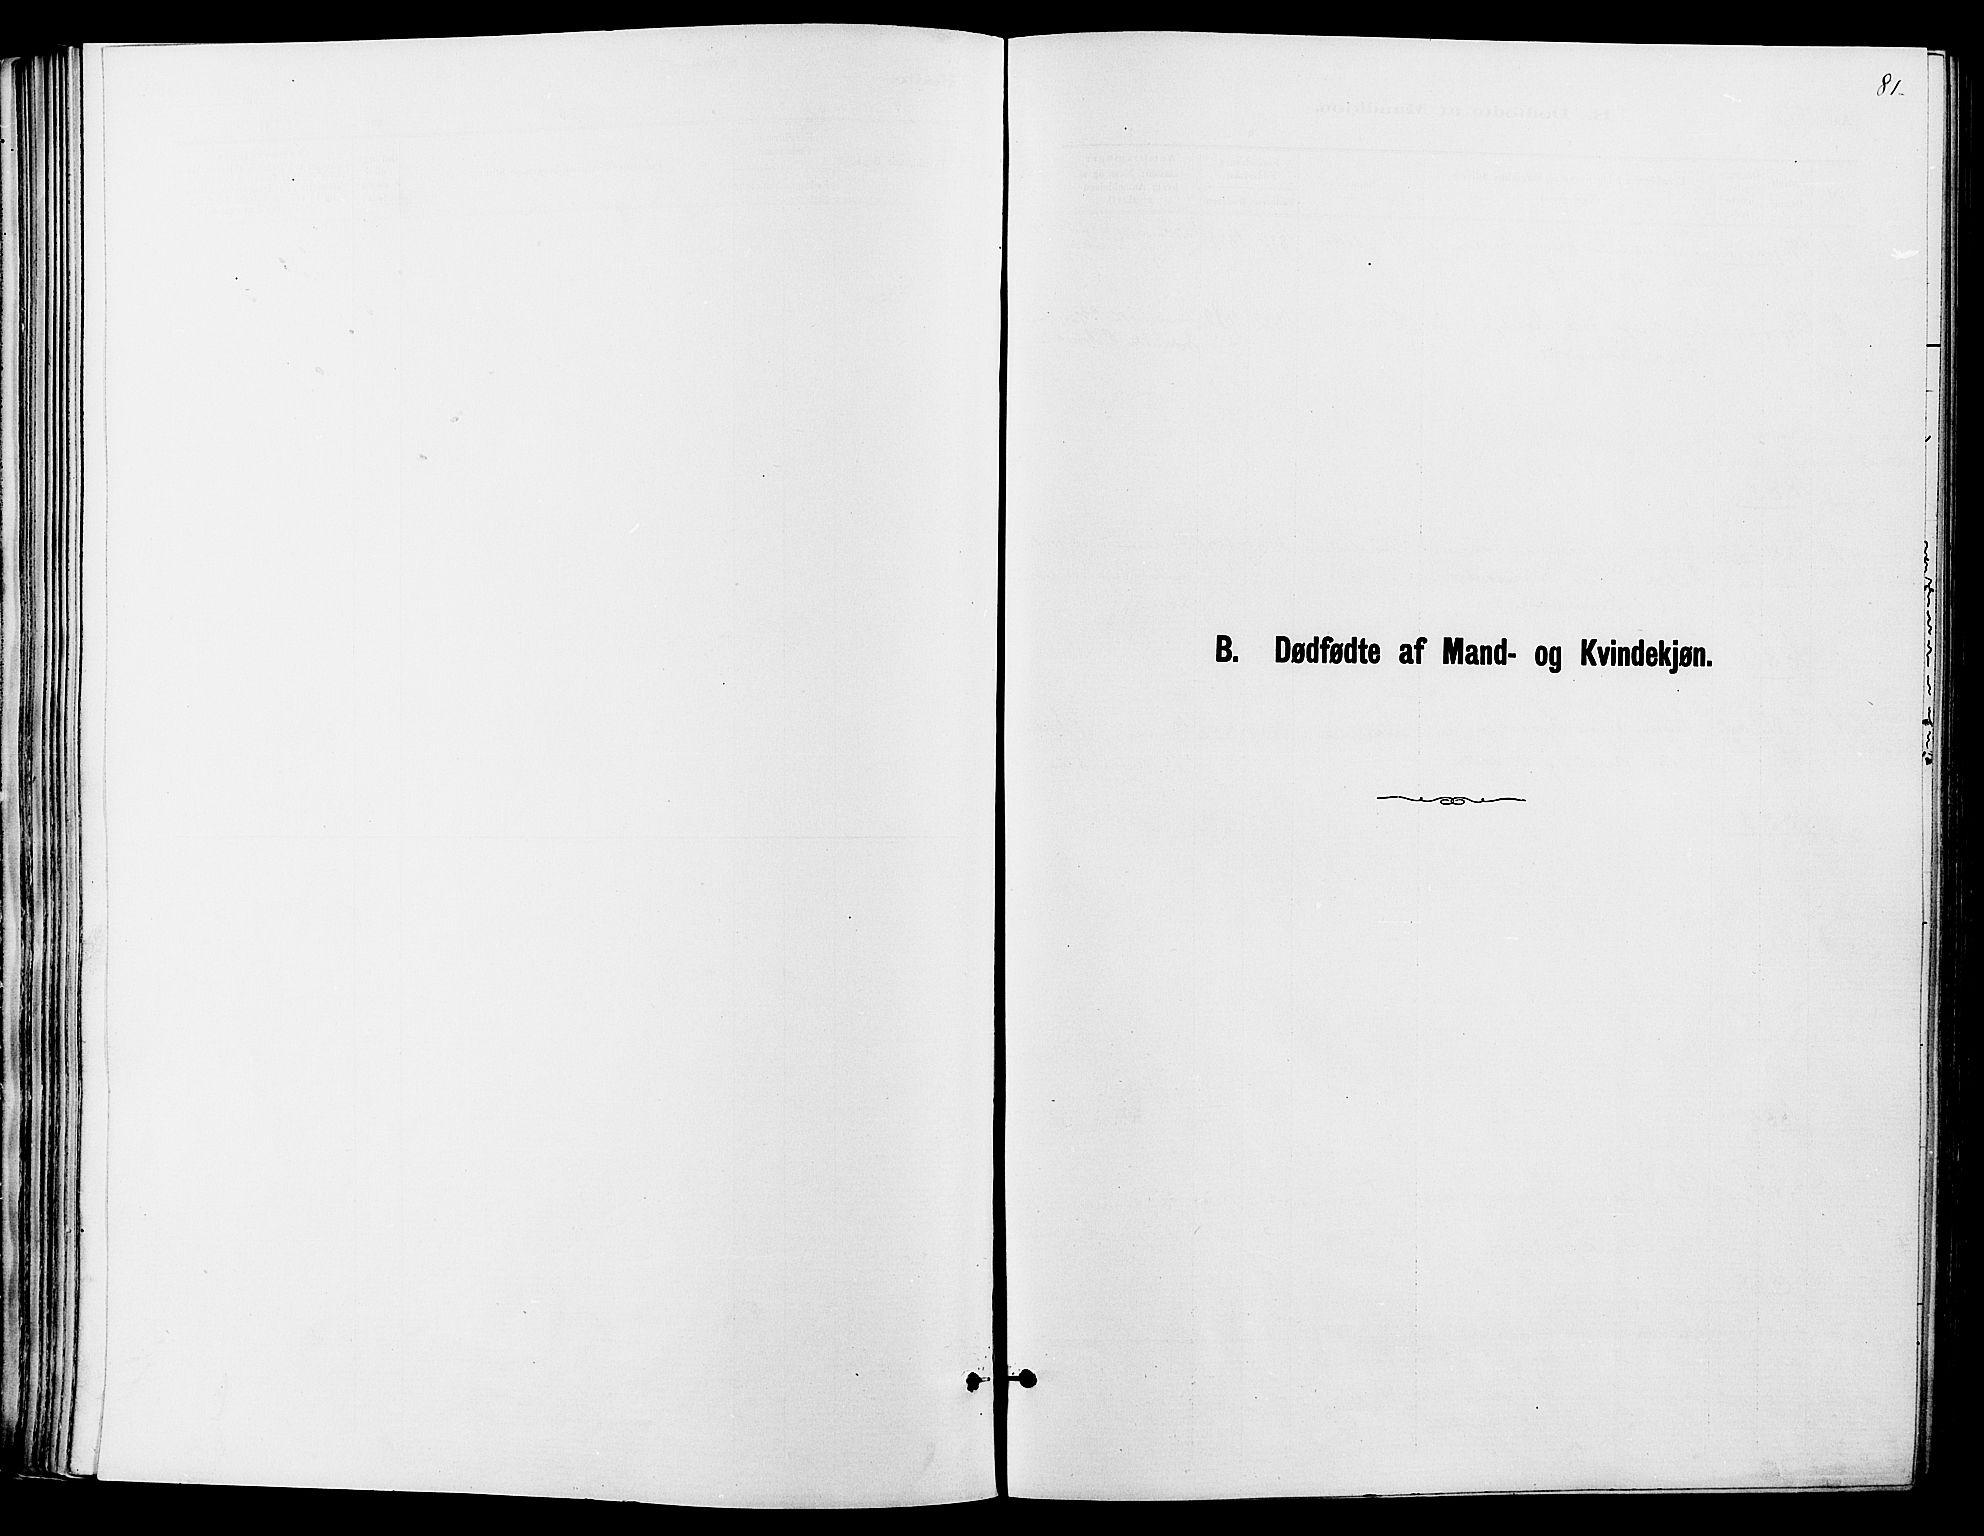 SAH, Dovre prestekontor, Ministerialbok nr. 2, 1879-1890, s. 81